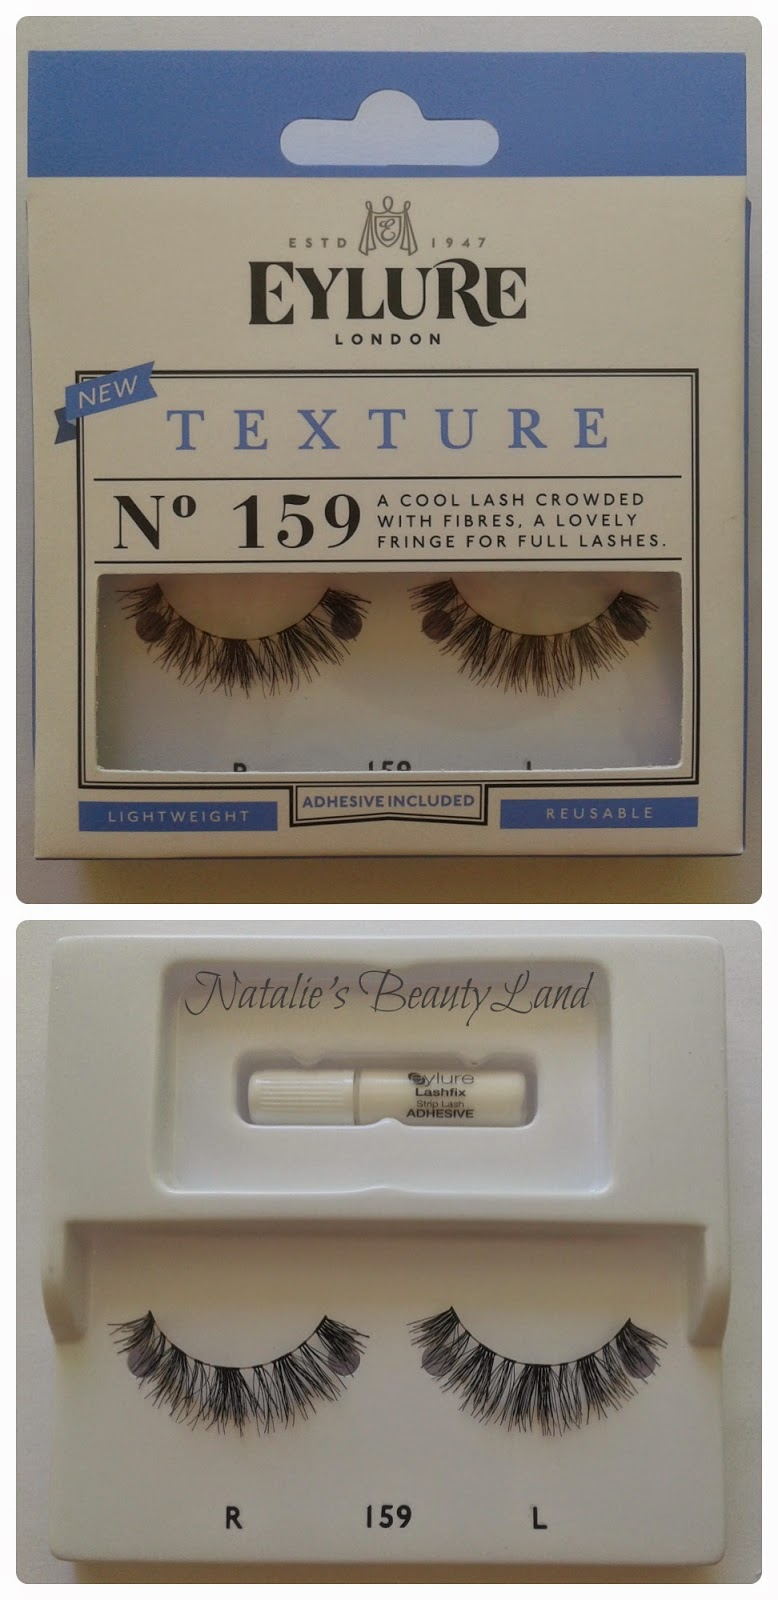 Eylure eyelashes for nye {gr}